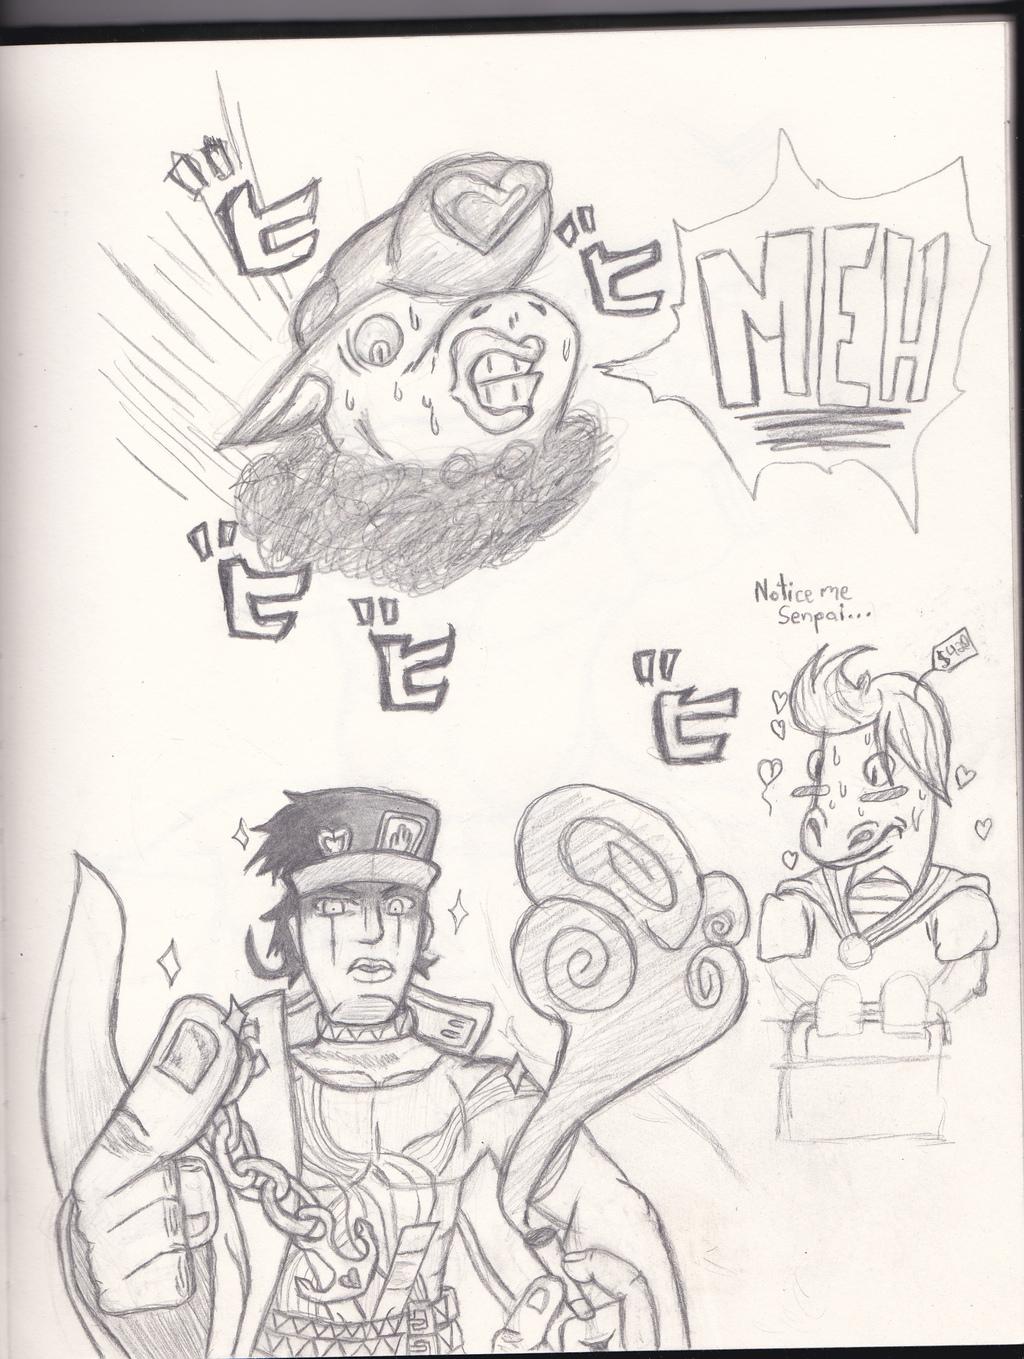 "Most recent image: Tsugi ni omae wa ""Just random stuff"" toiu"